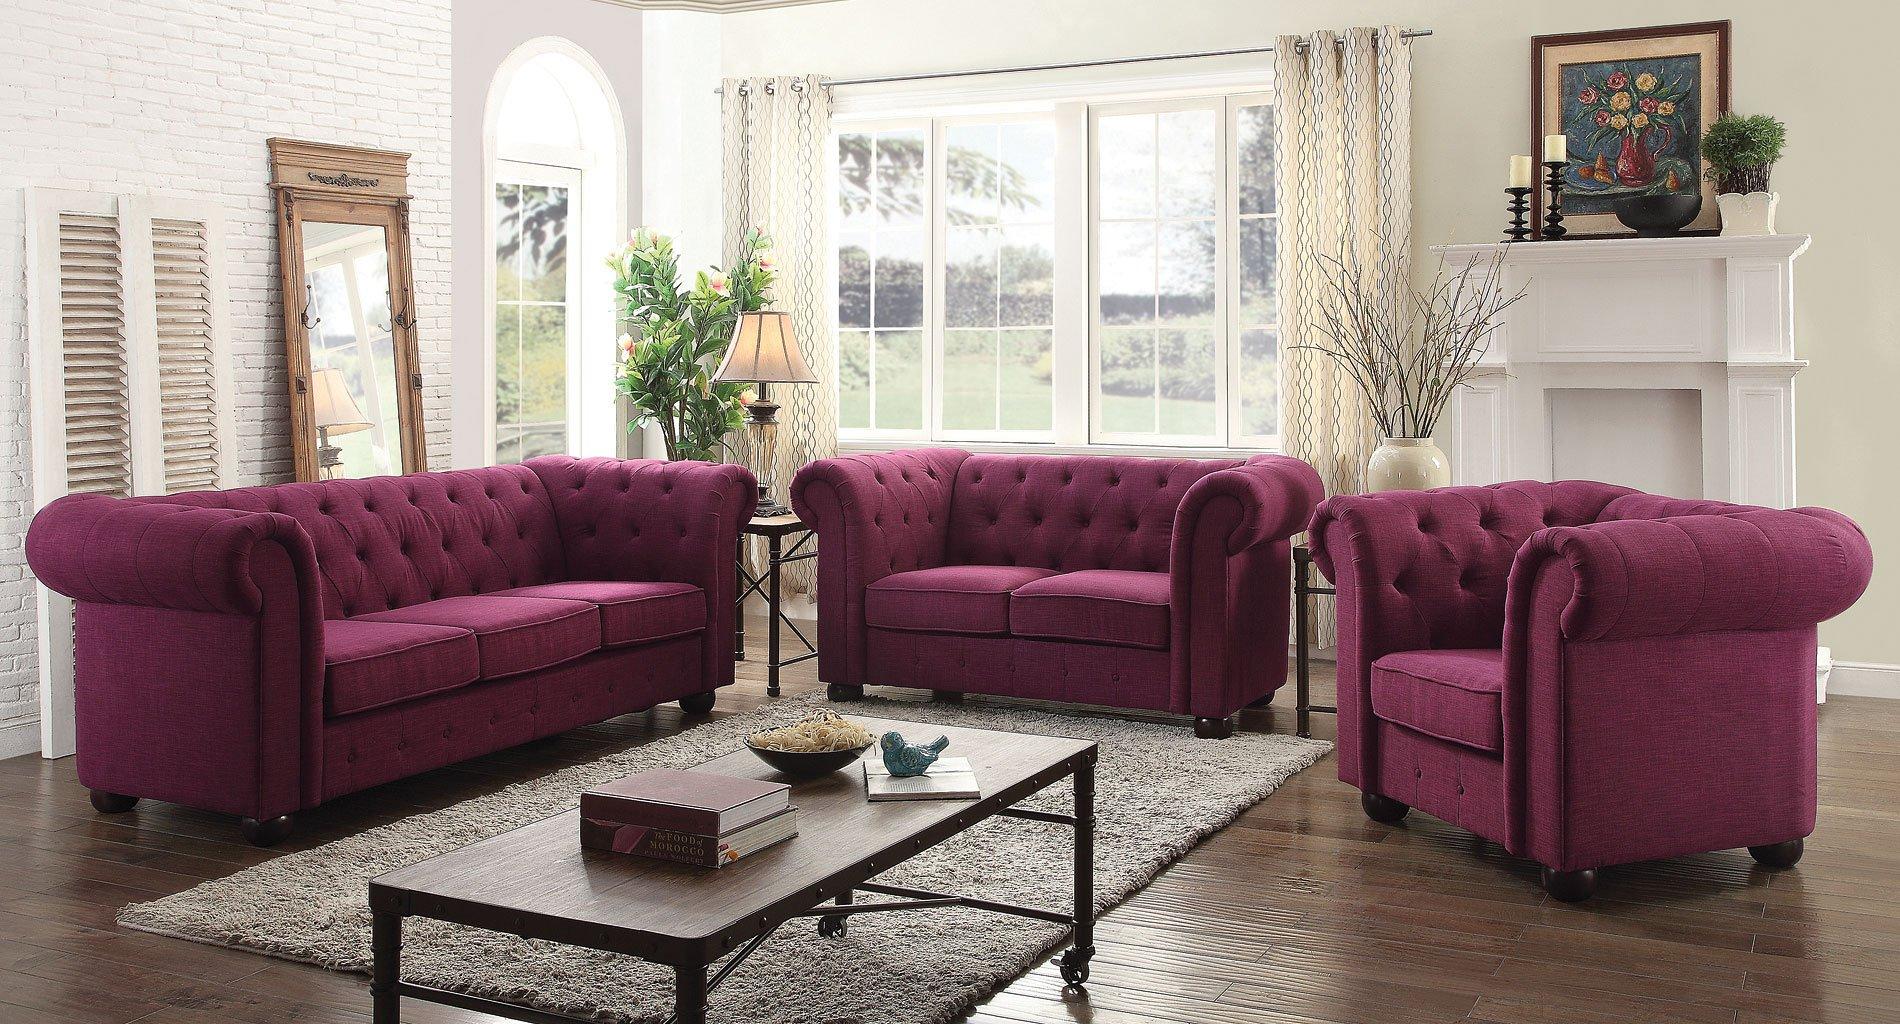 G498 tufted living room set berry